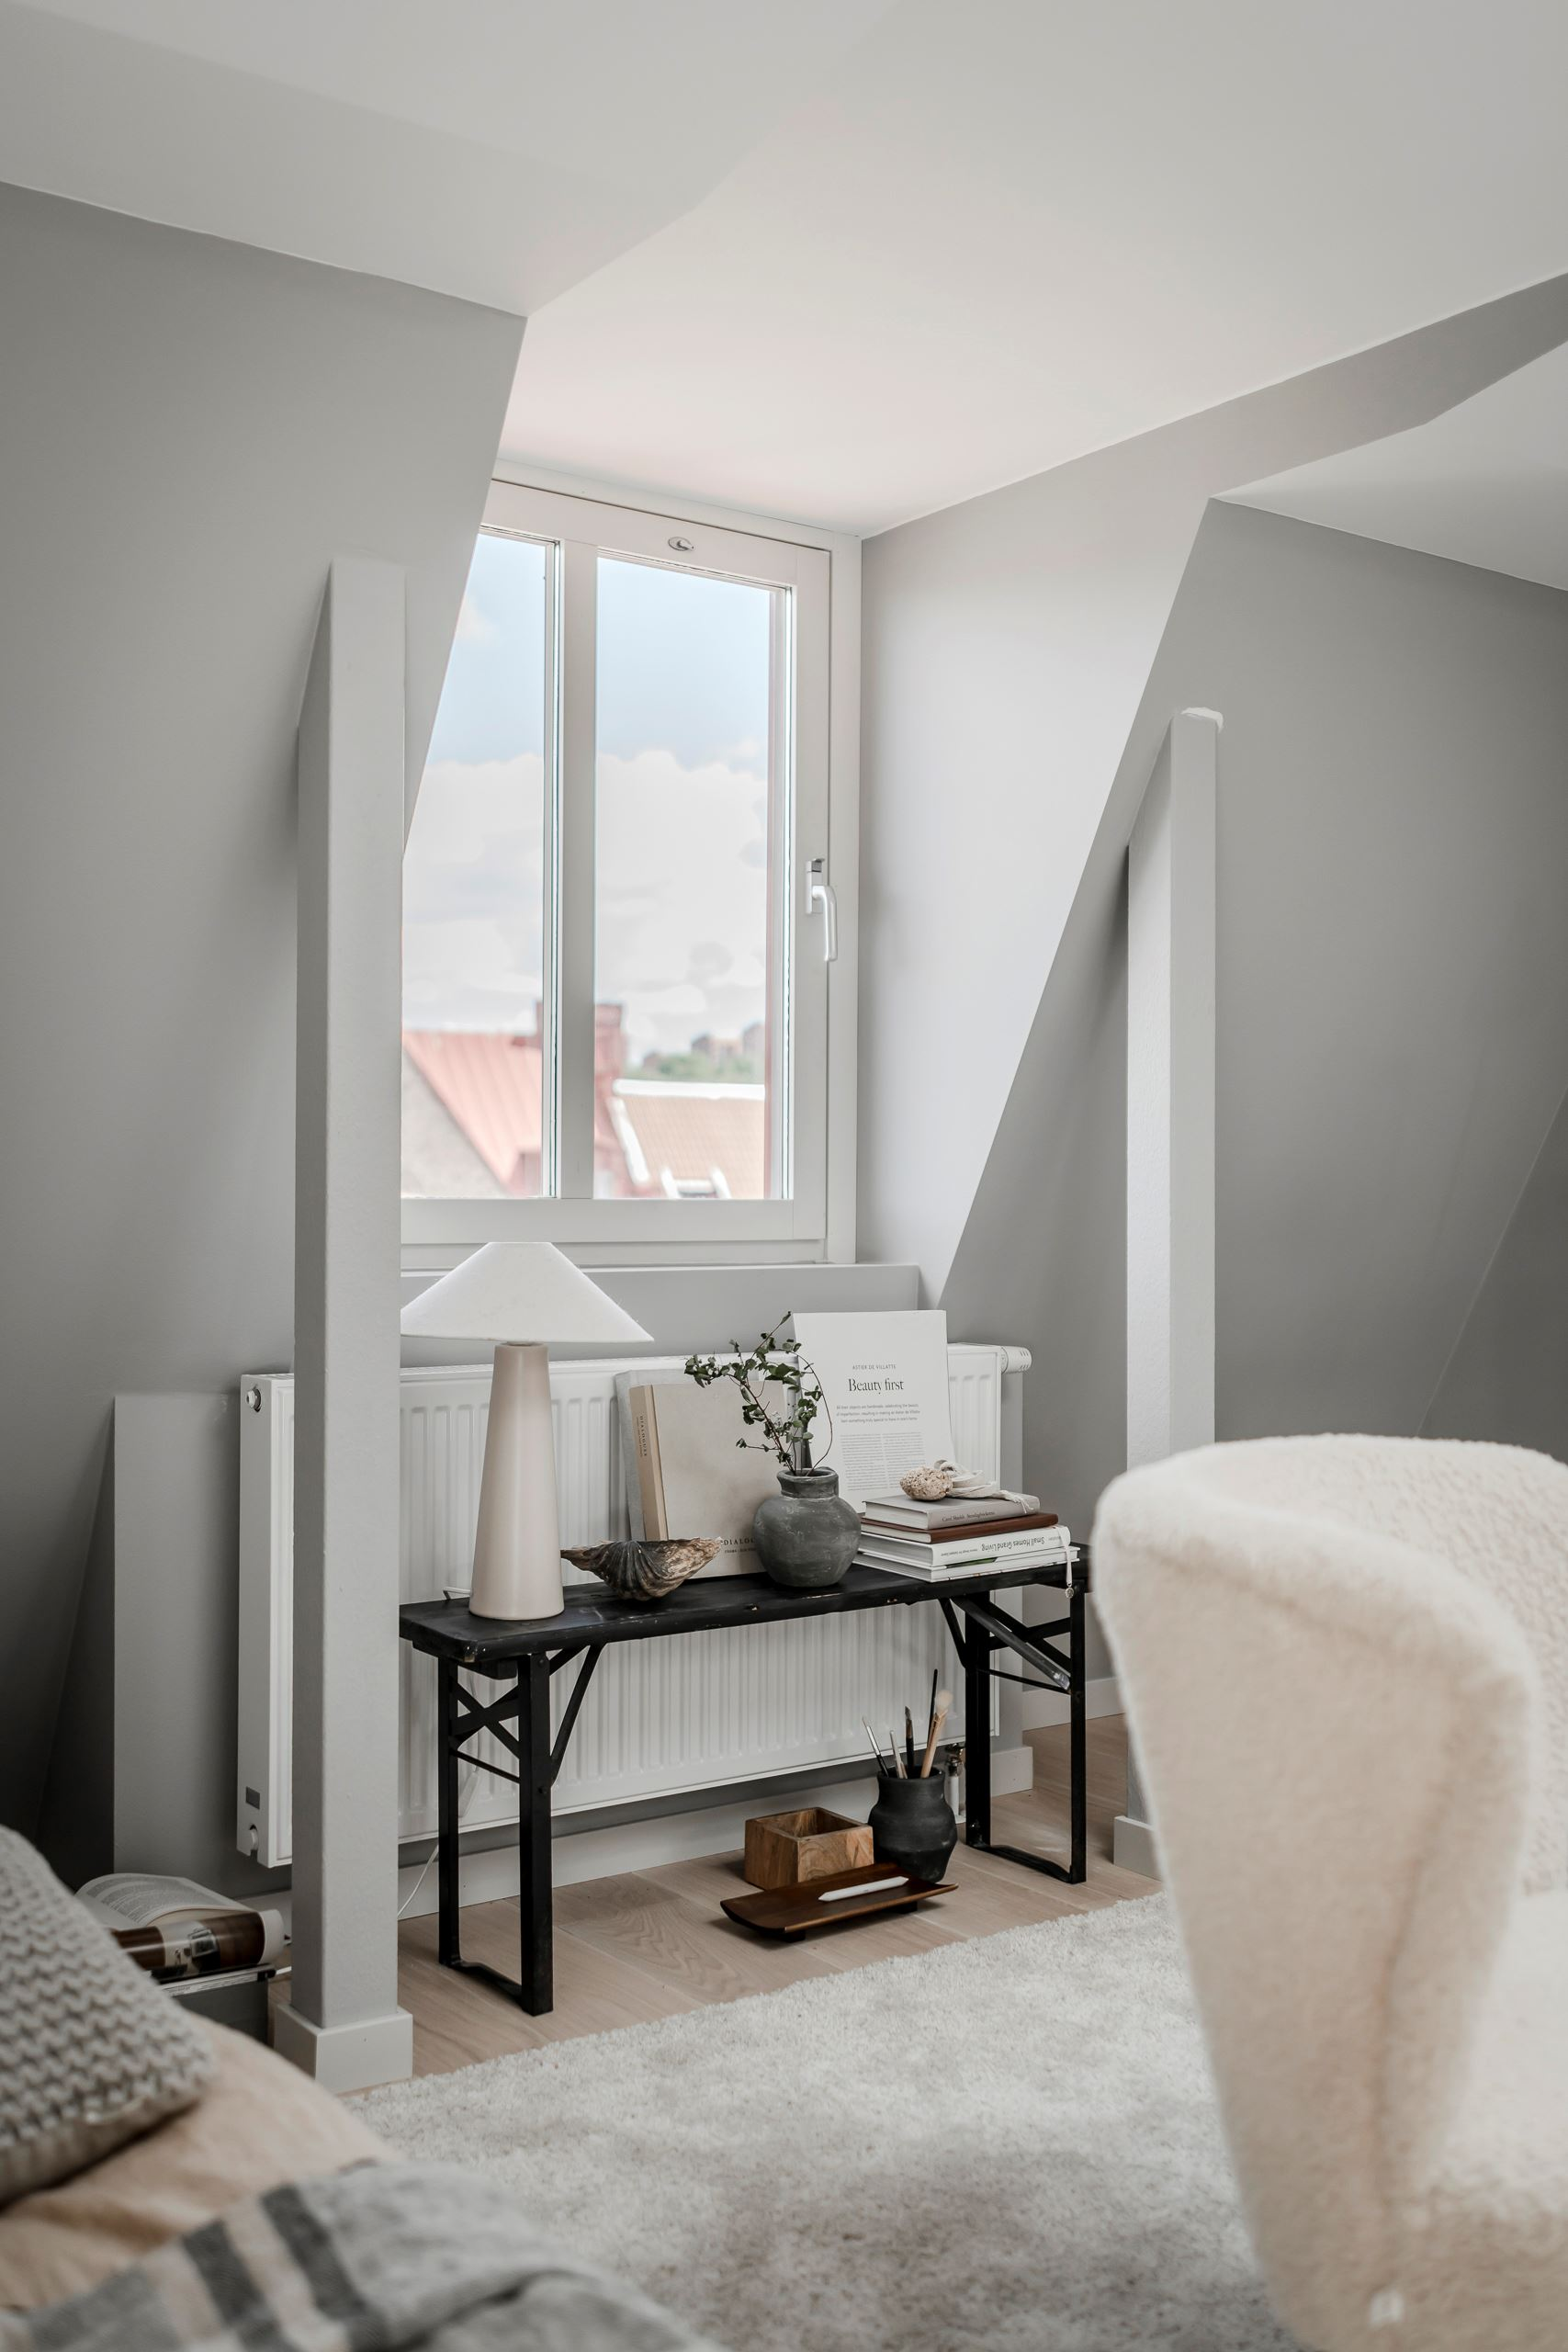 Plan deschis și decor nordic într o garsonieră la mansardă 35 m² 16